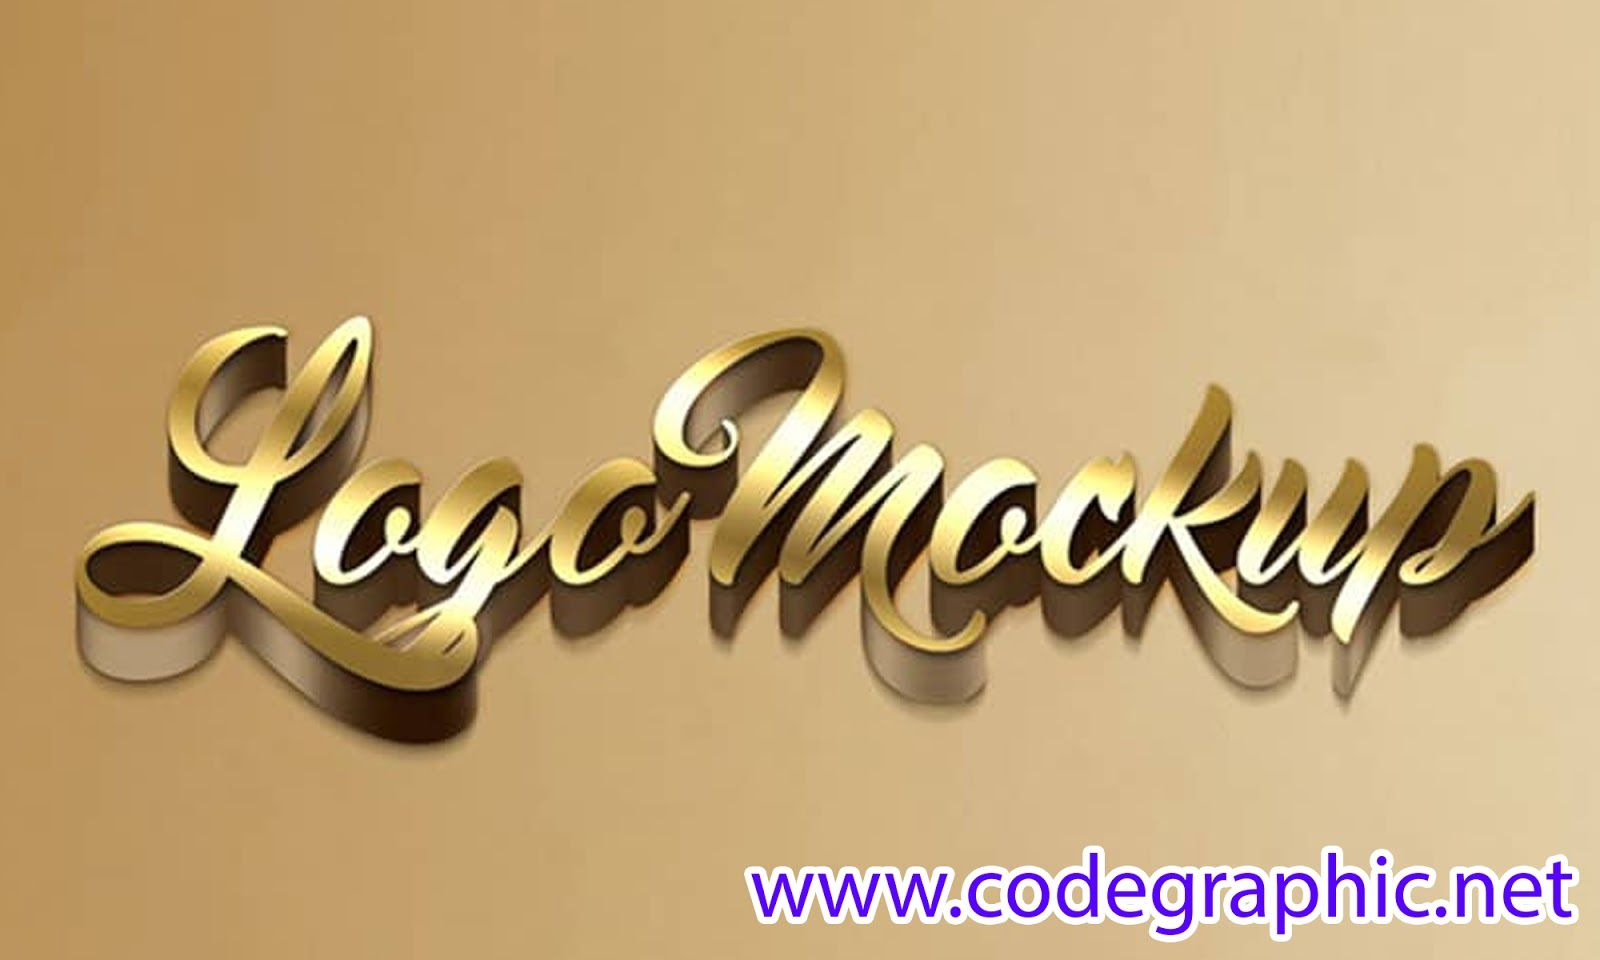 Free Download 3d Logo Mockup In Psd File 2019 Code Graphic Logo Mockup 3d Logo Logo Mockups Psd